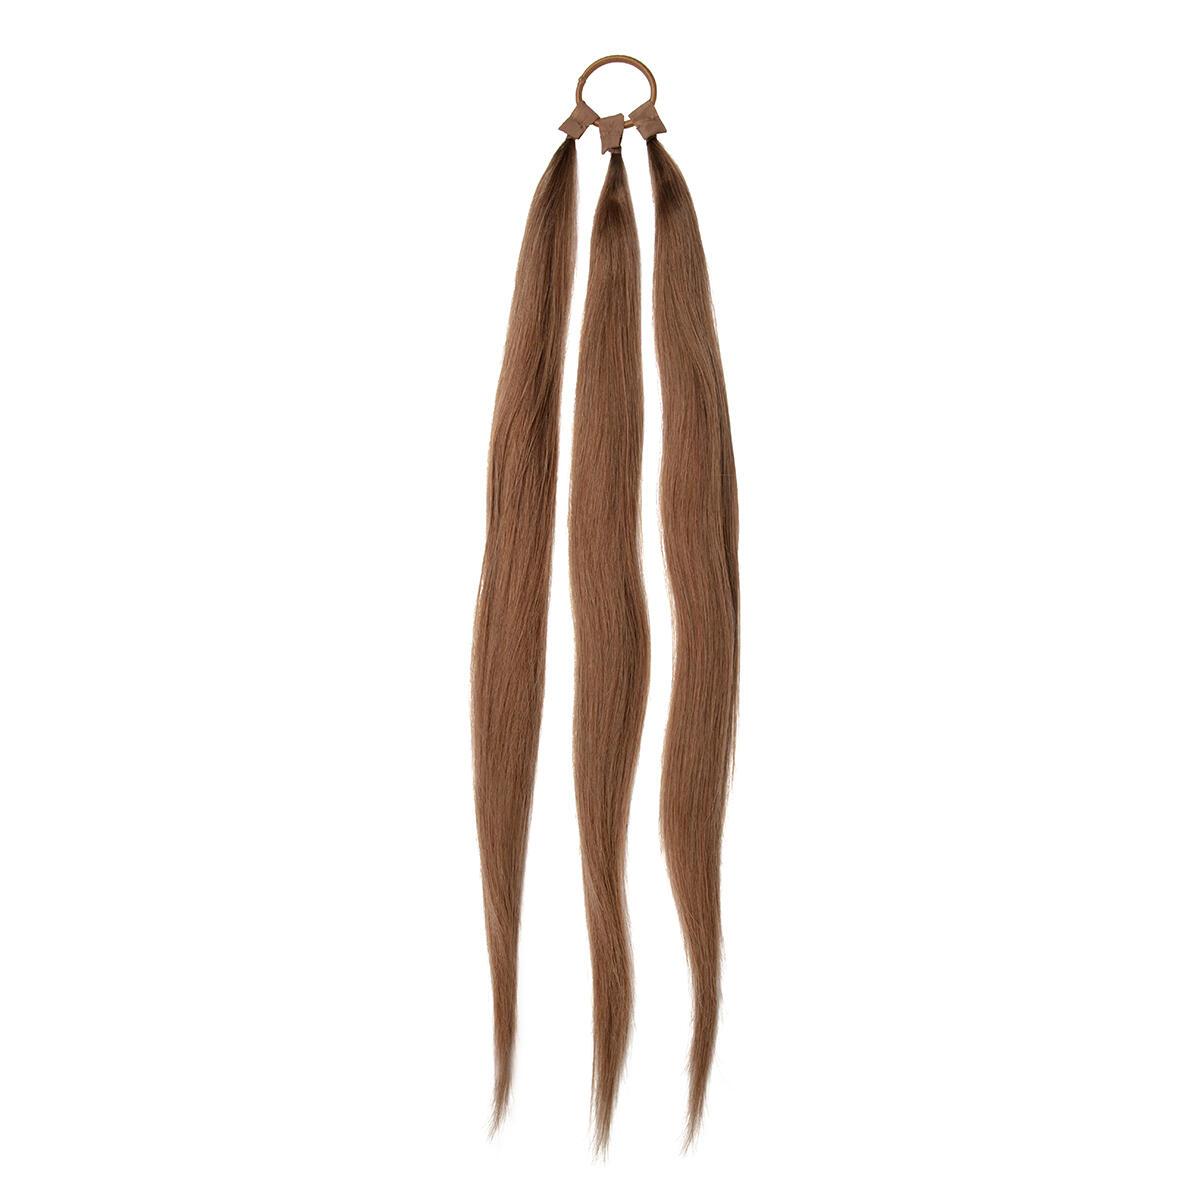 Easy Braid Original 5.1 Medium Ash Brown 55 cm